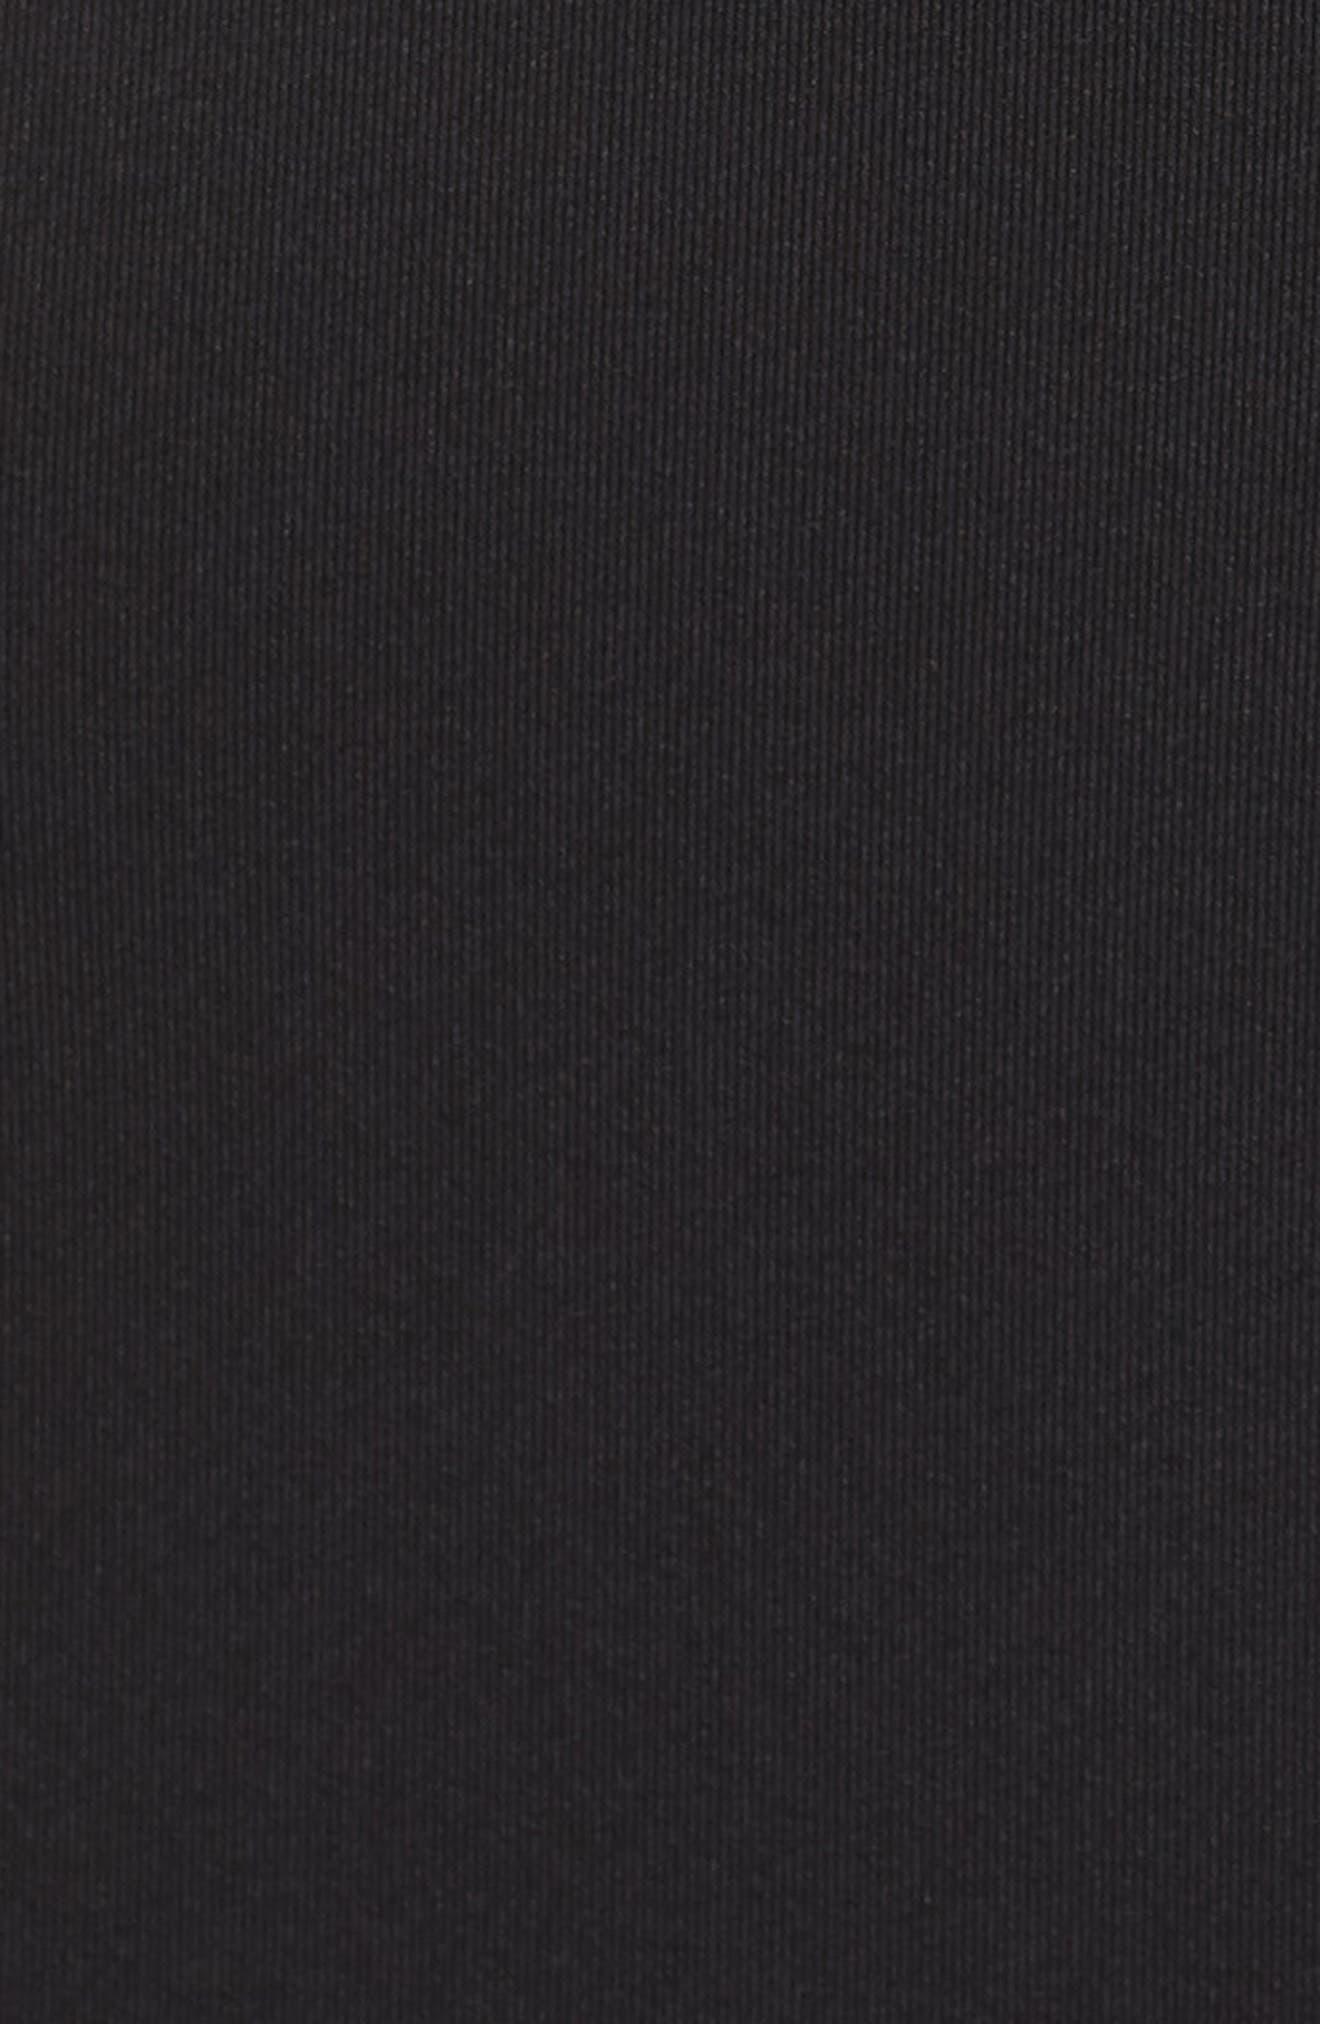 Embellished Illusion Body-Con Dress,                             Alternate thumbnail 5, color,                             BLACK